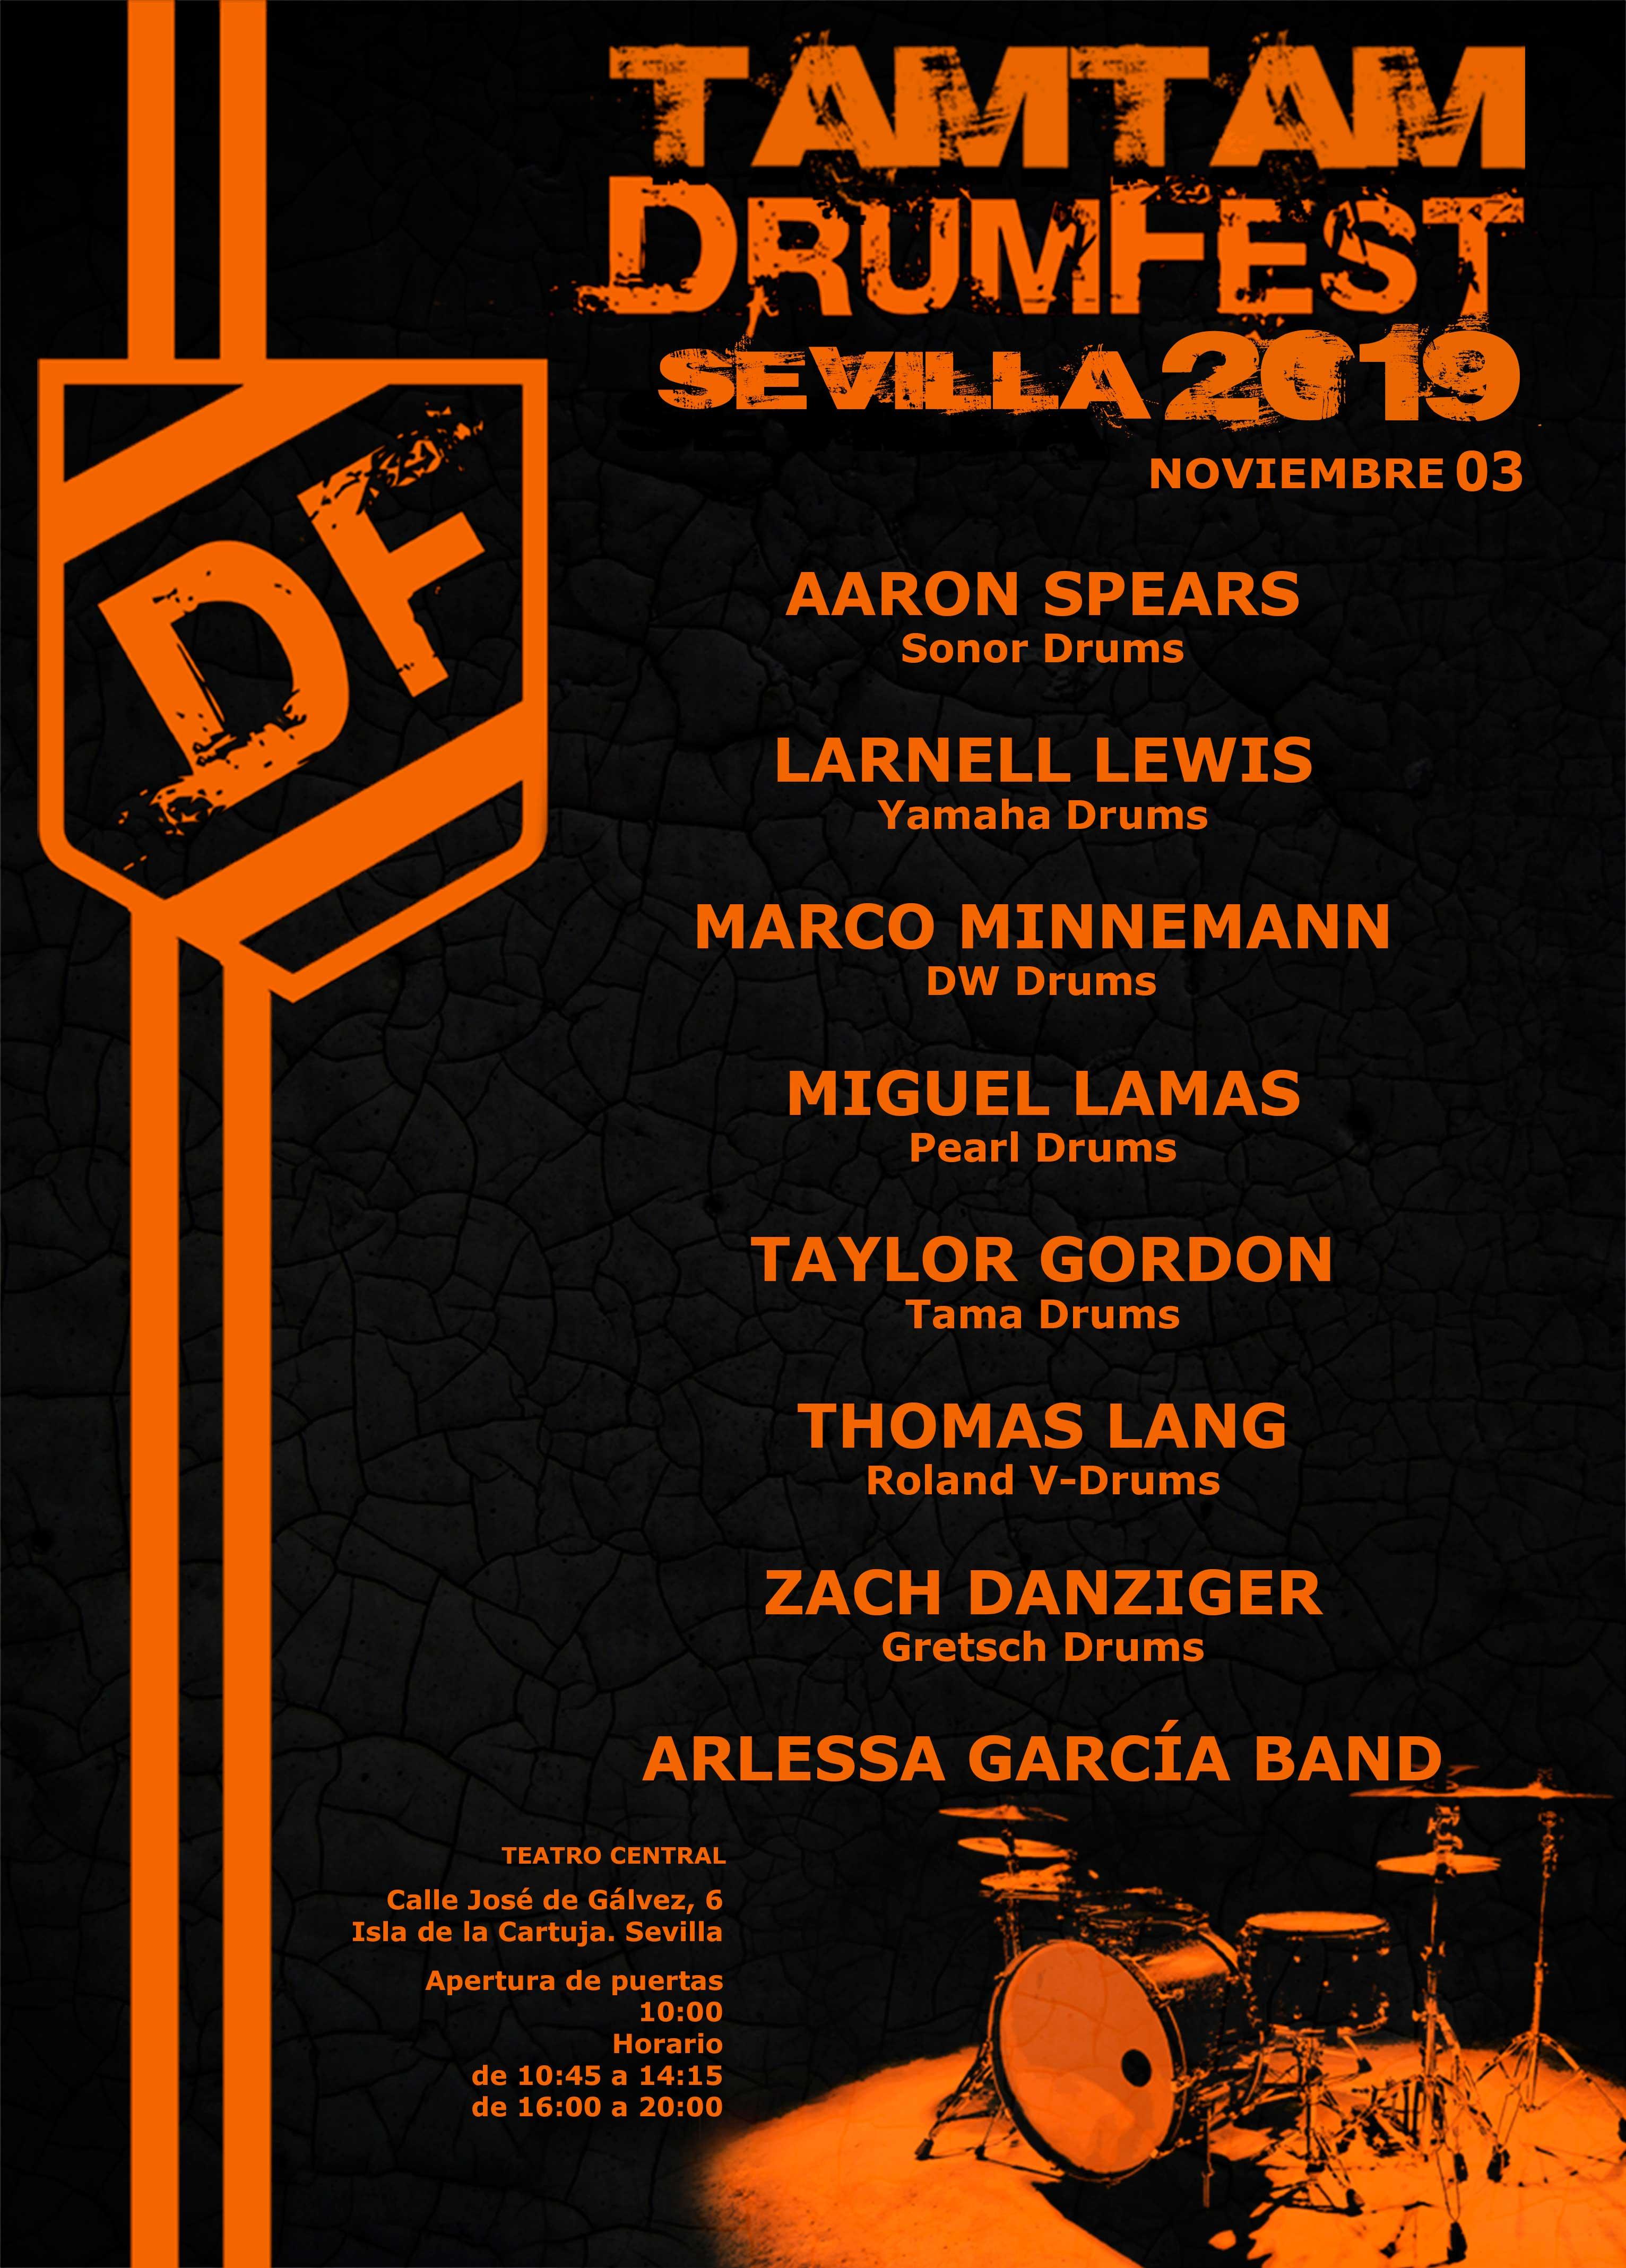 TamTam DrumFest Sevilla 2019